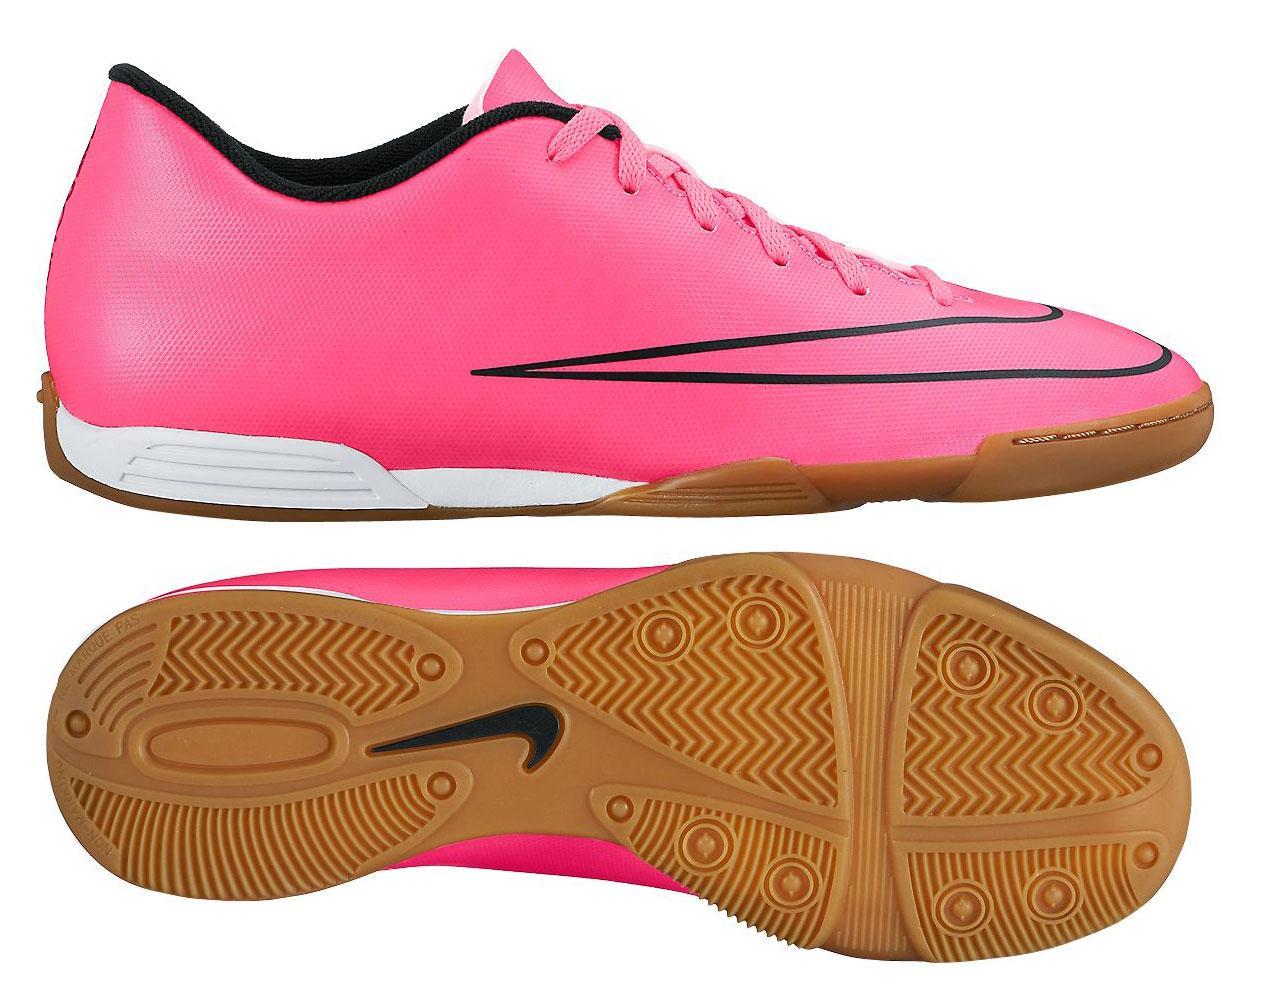 Nike Mercurial Vortex II IC Pink/Svart